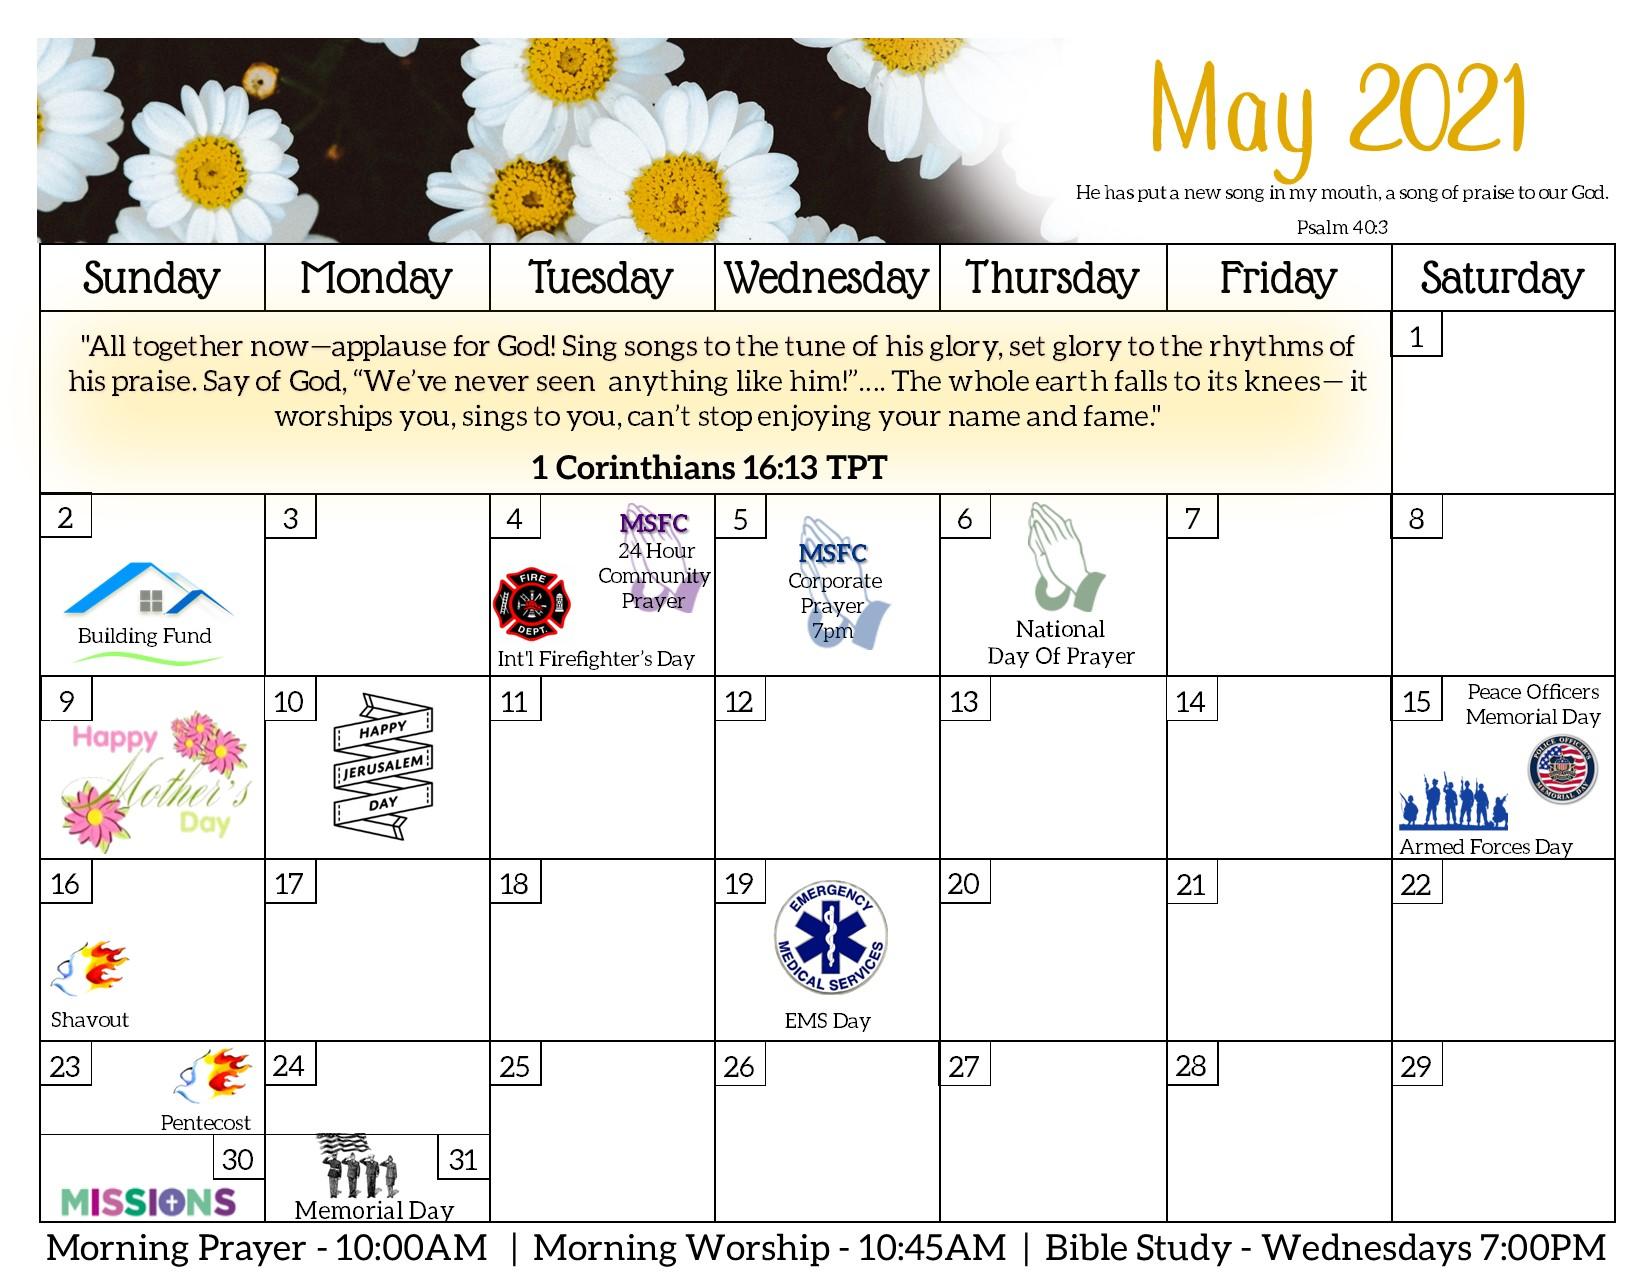 MorningStar Family Church Thurmont APR2021 Calendar